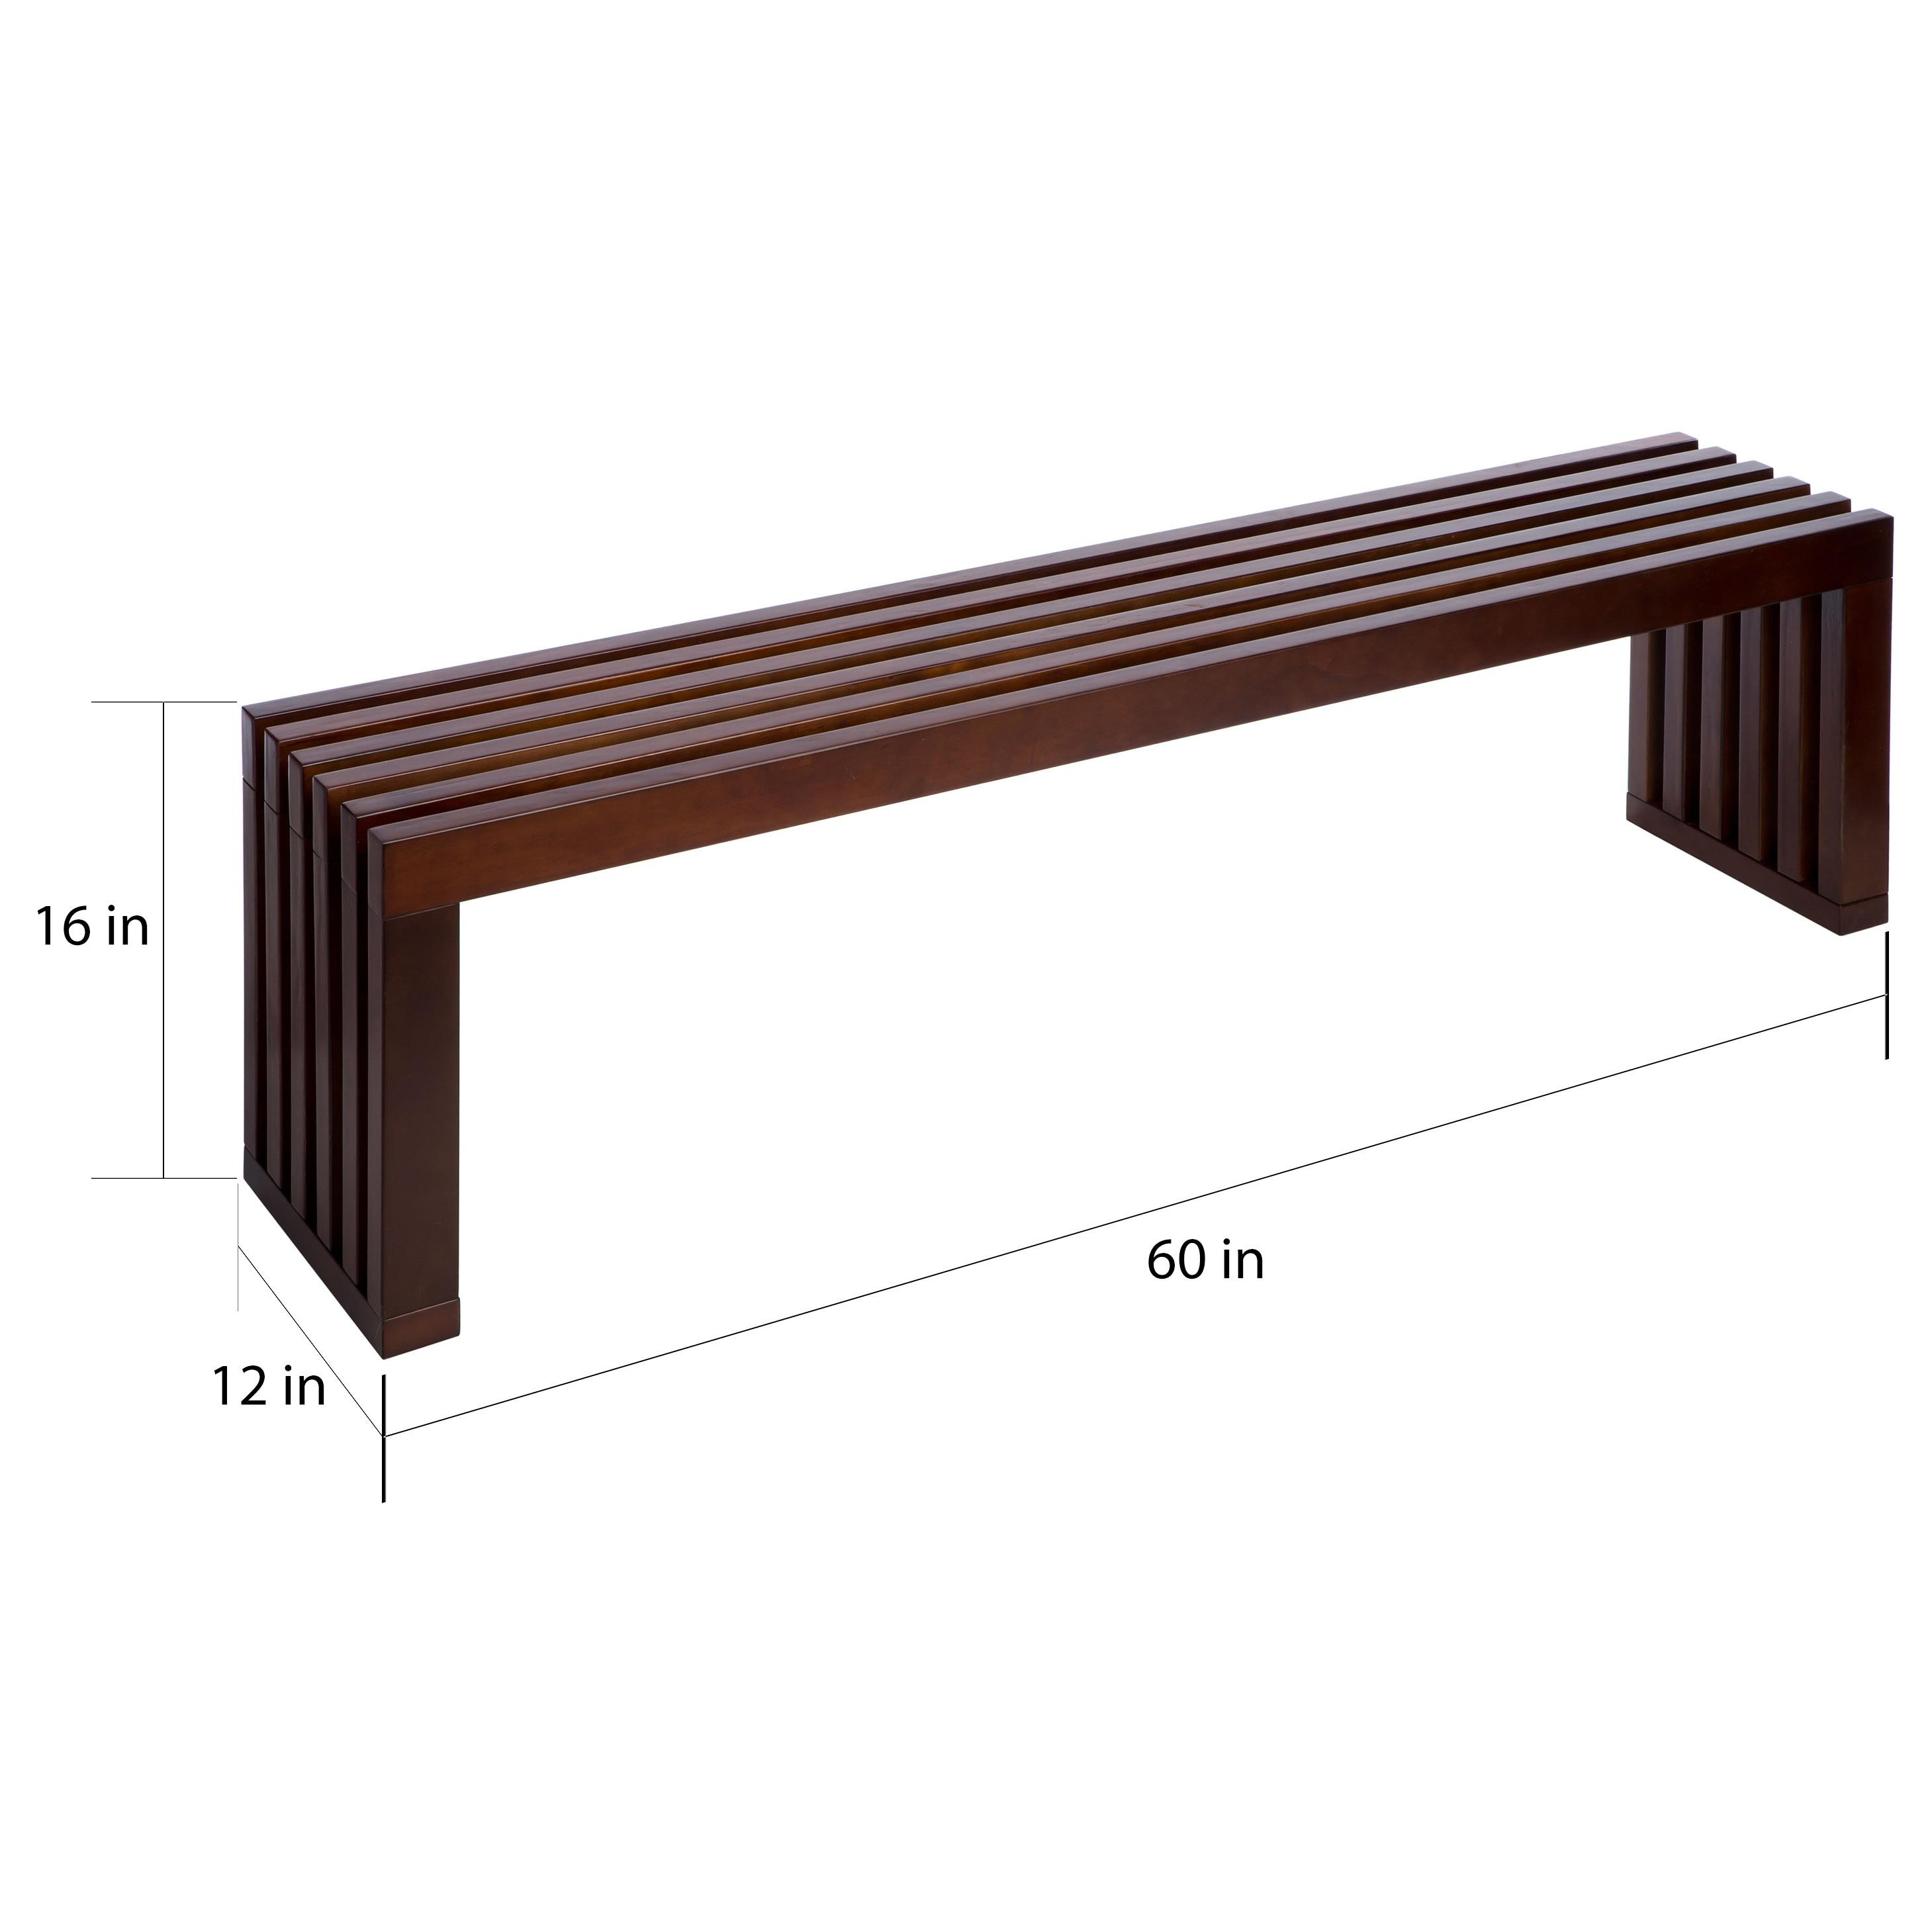 Walnut Finish 60 inch Slat Bench Free Shipping Today Overstock